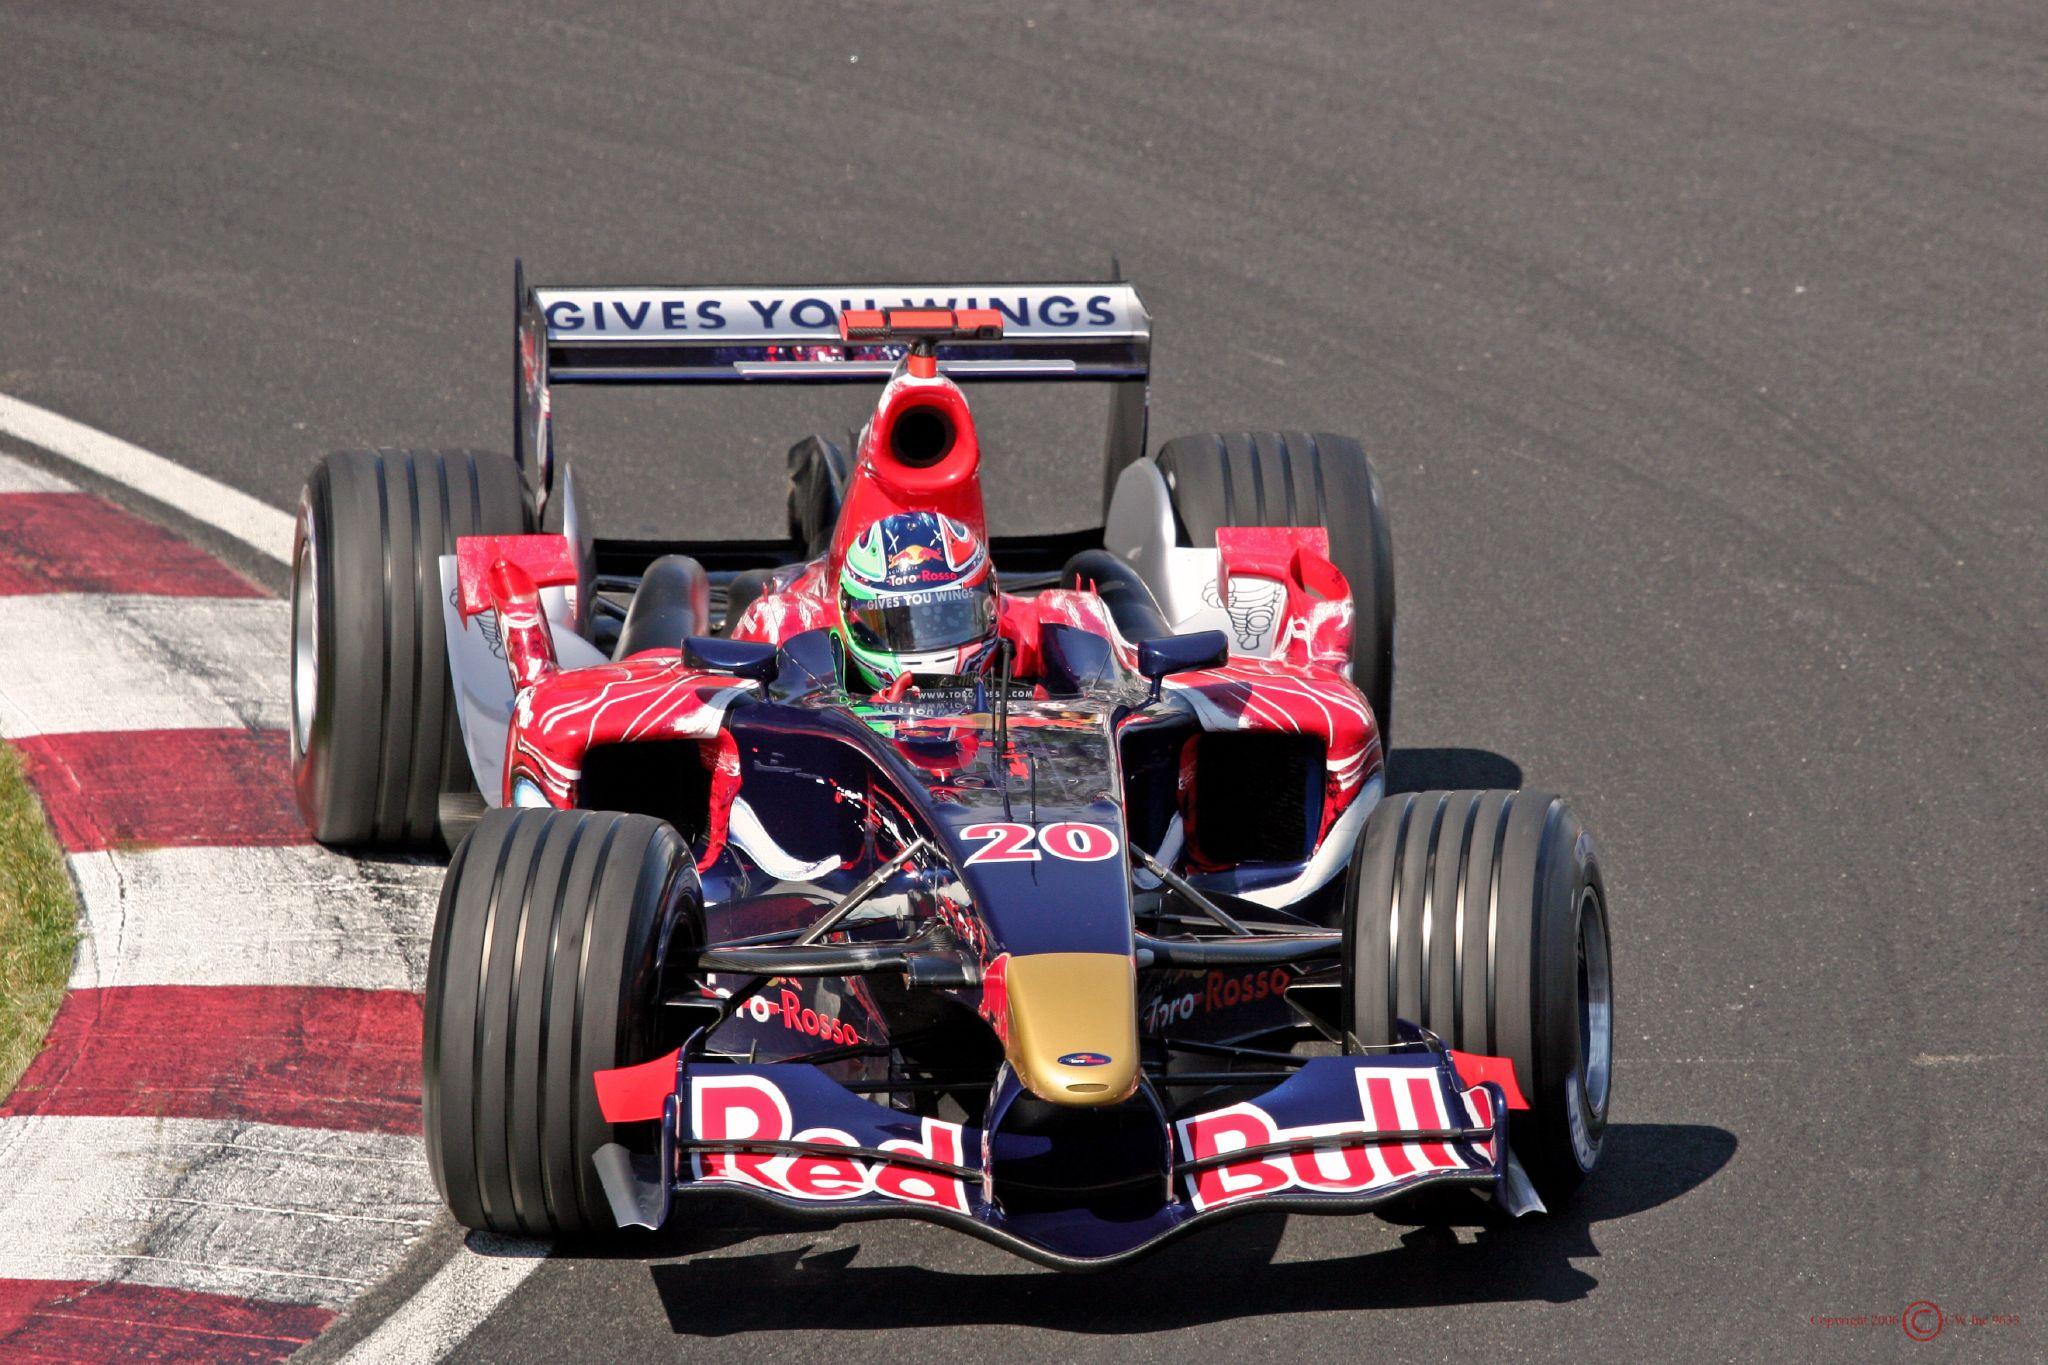 Equipe Toro Rosso de Formula 1 de 2006 - by wikipedia.org